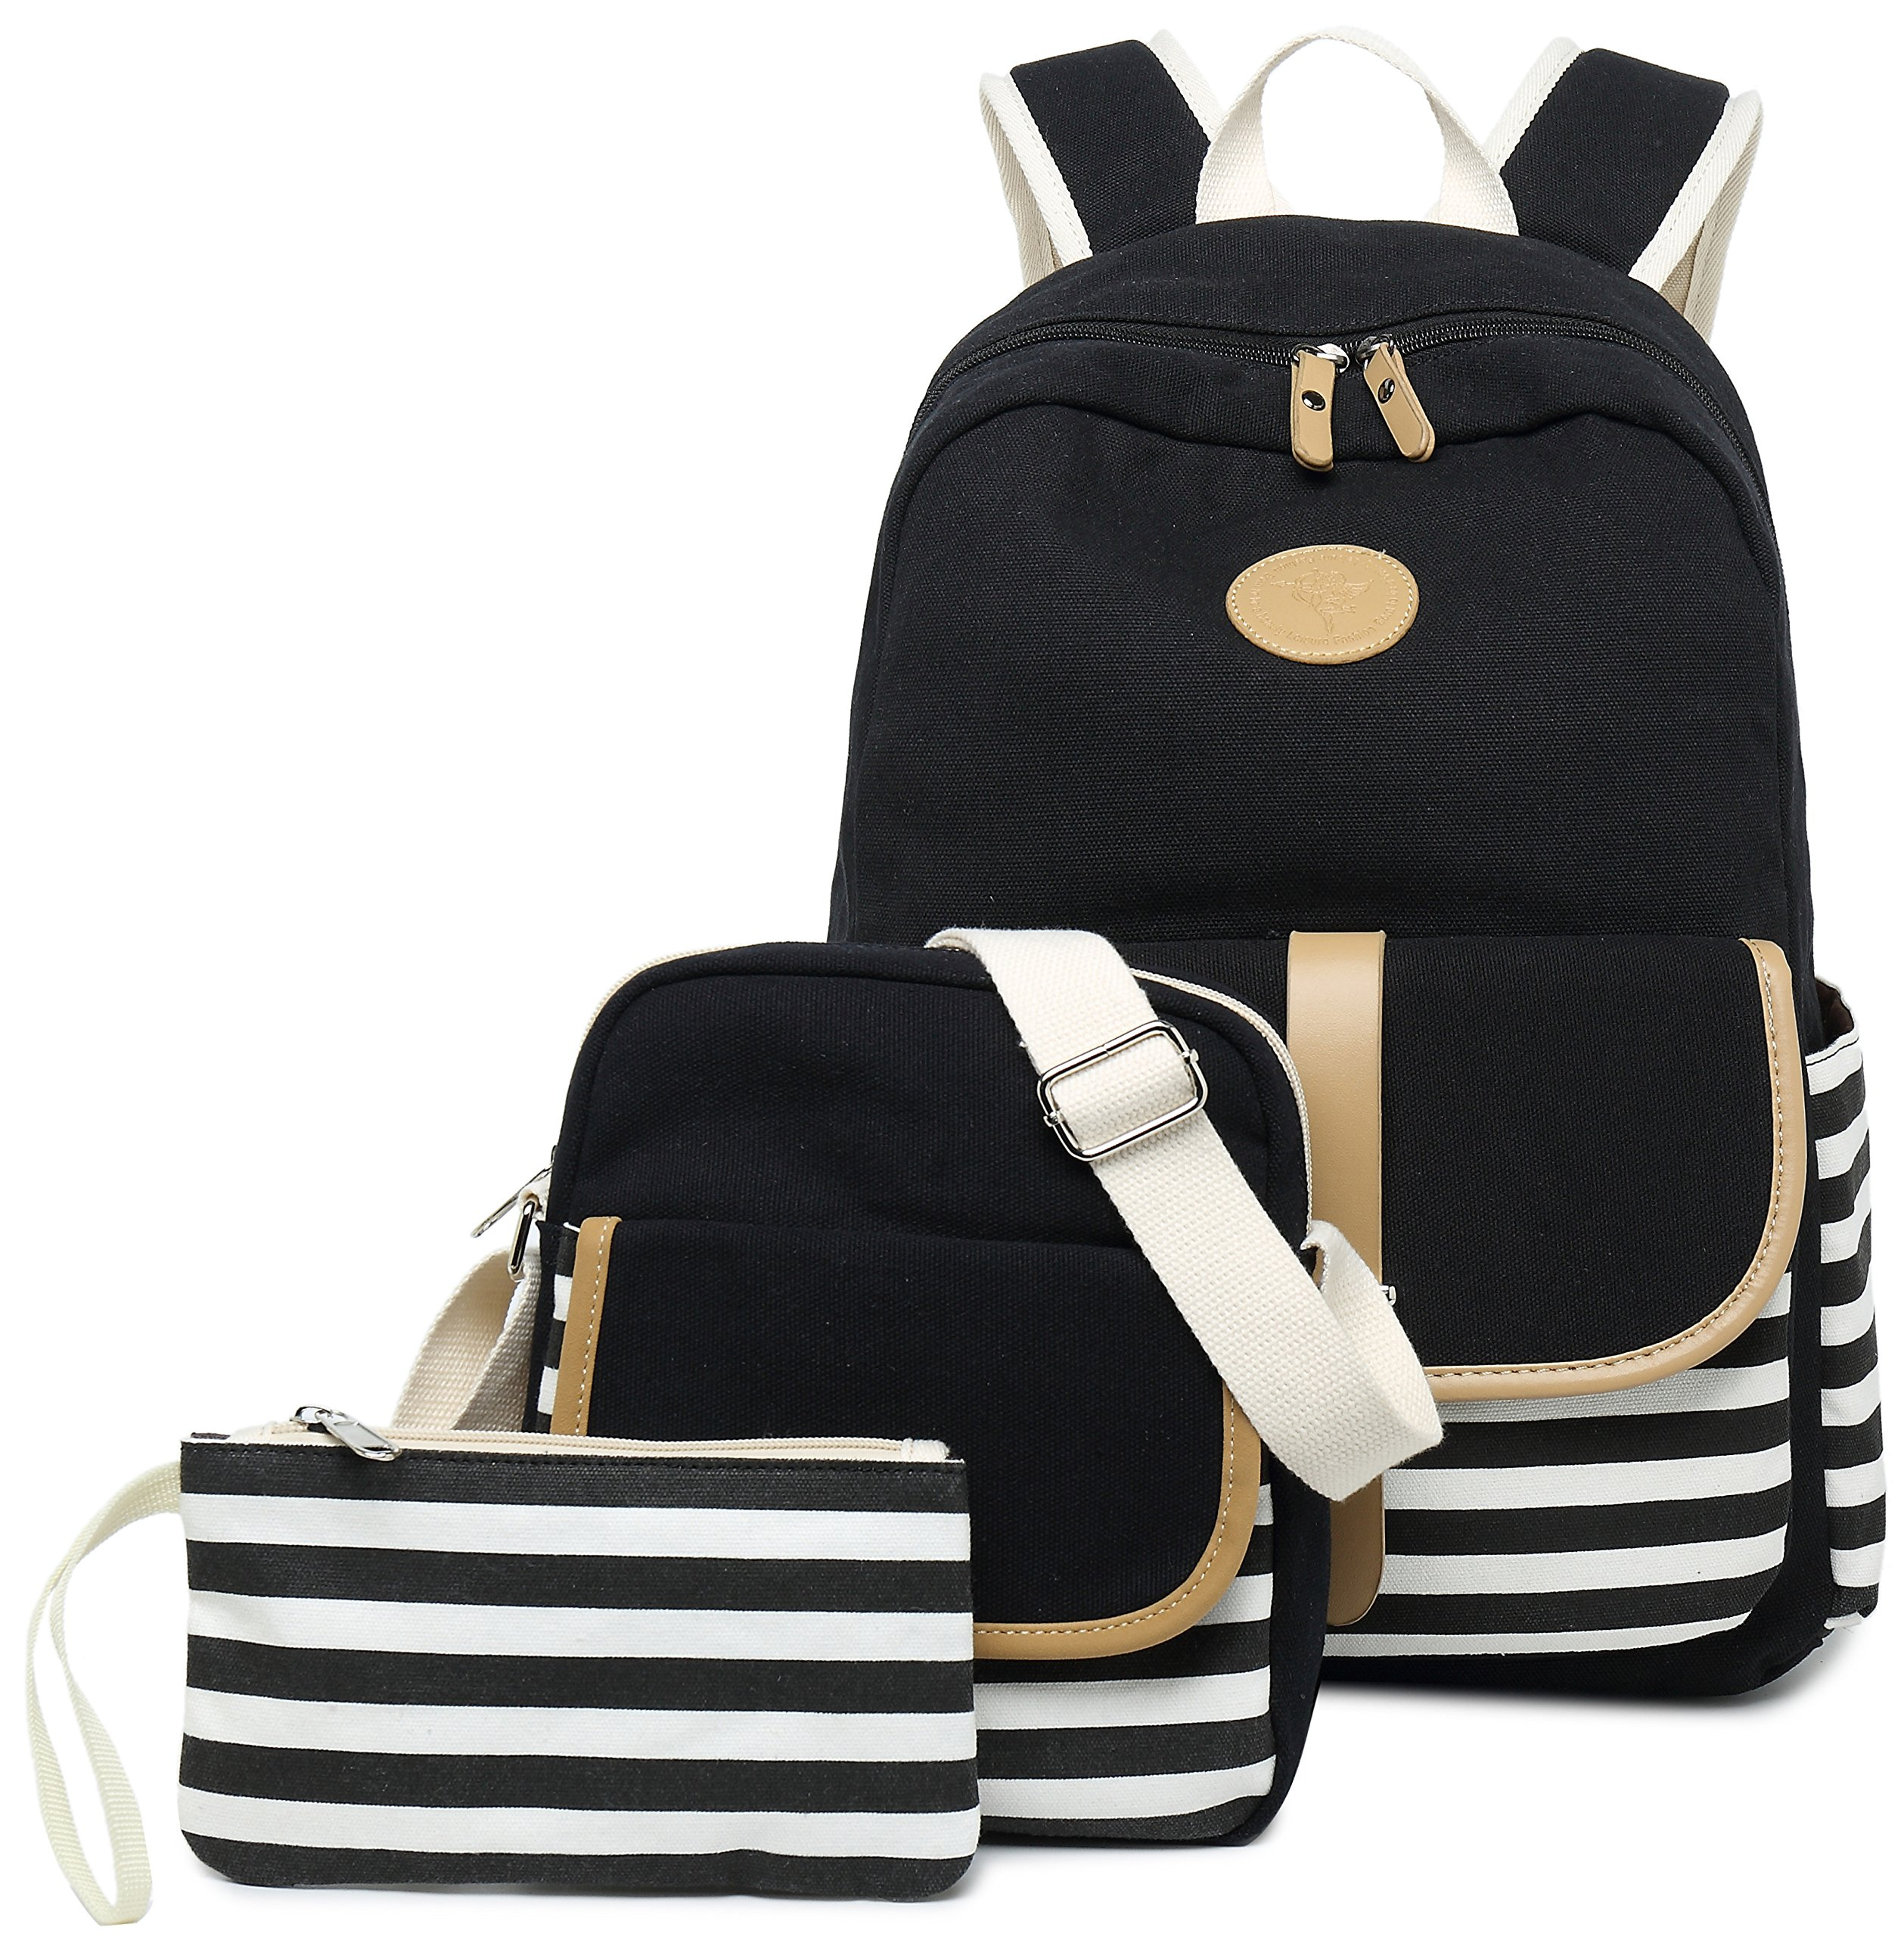 School Backpack for Girls, Gazigo Womens High School College Bookbags Laptop Bag (Black) by Gazigo (Image #2)